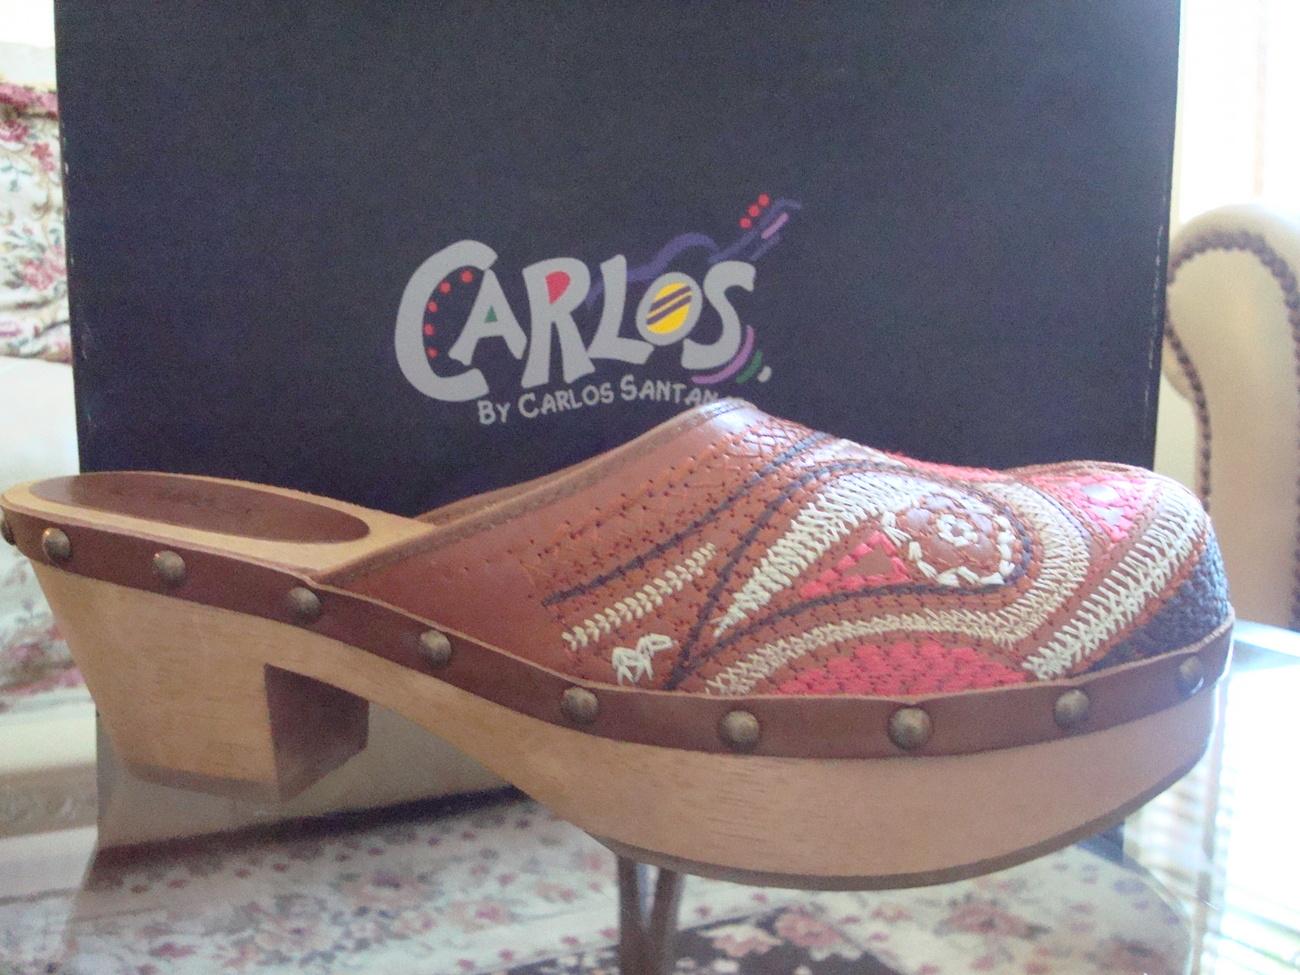 Carlos by Carlos Santana Women's 'Tribe' Clog Size 10 Bonanza